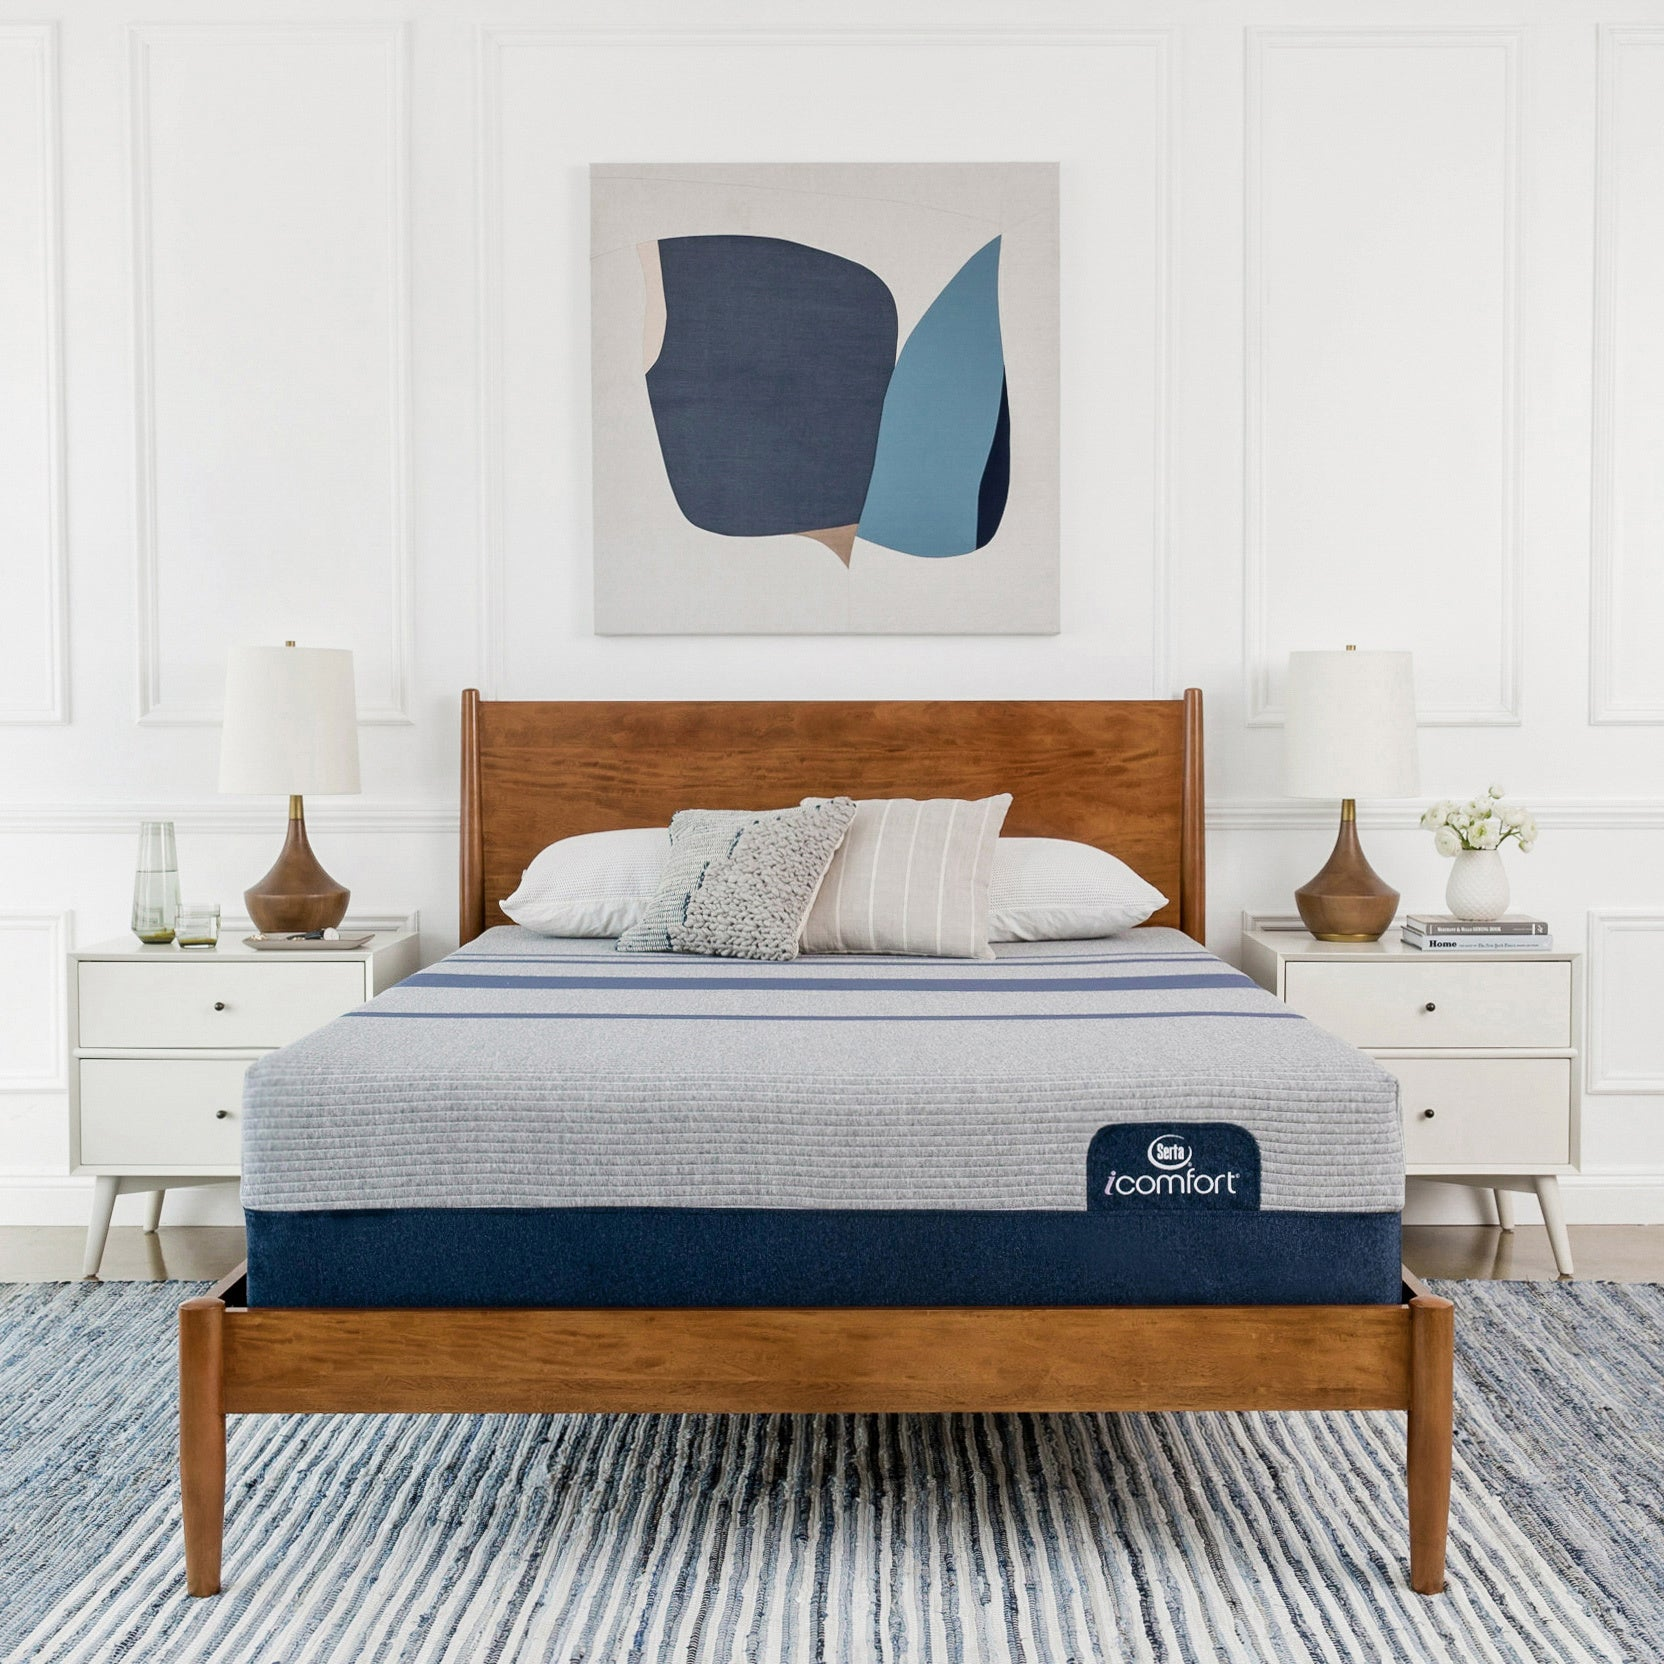 Memory Foam Mattress Queen Size Price Full Size Of Bedroomgood Twin Mattress Queen Size Bed